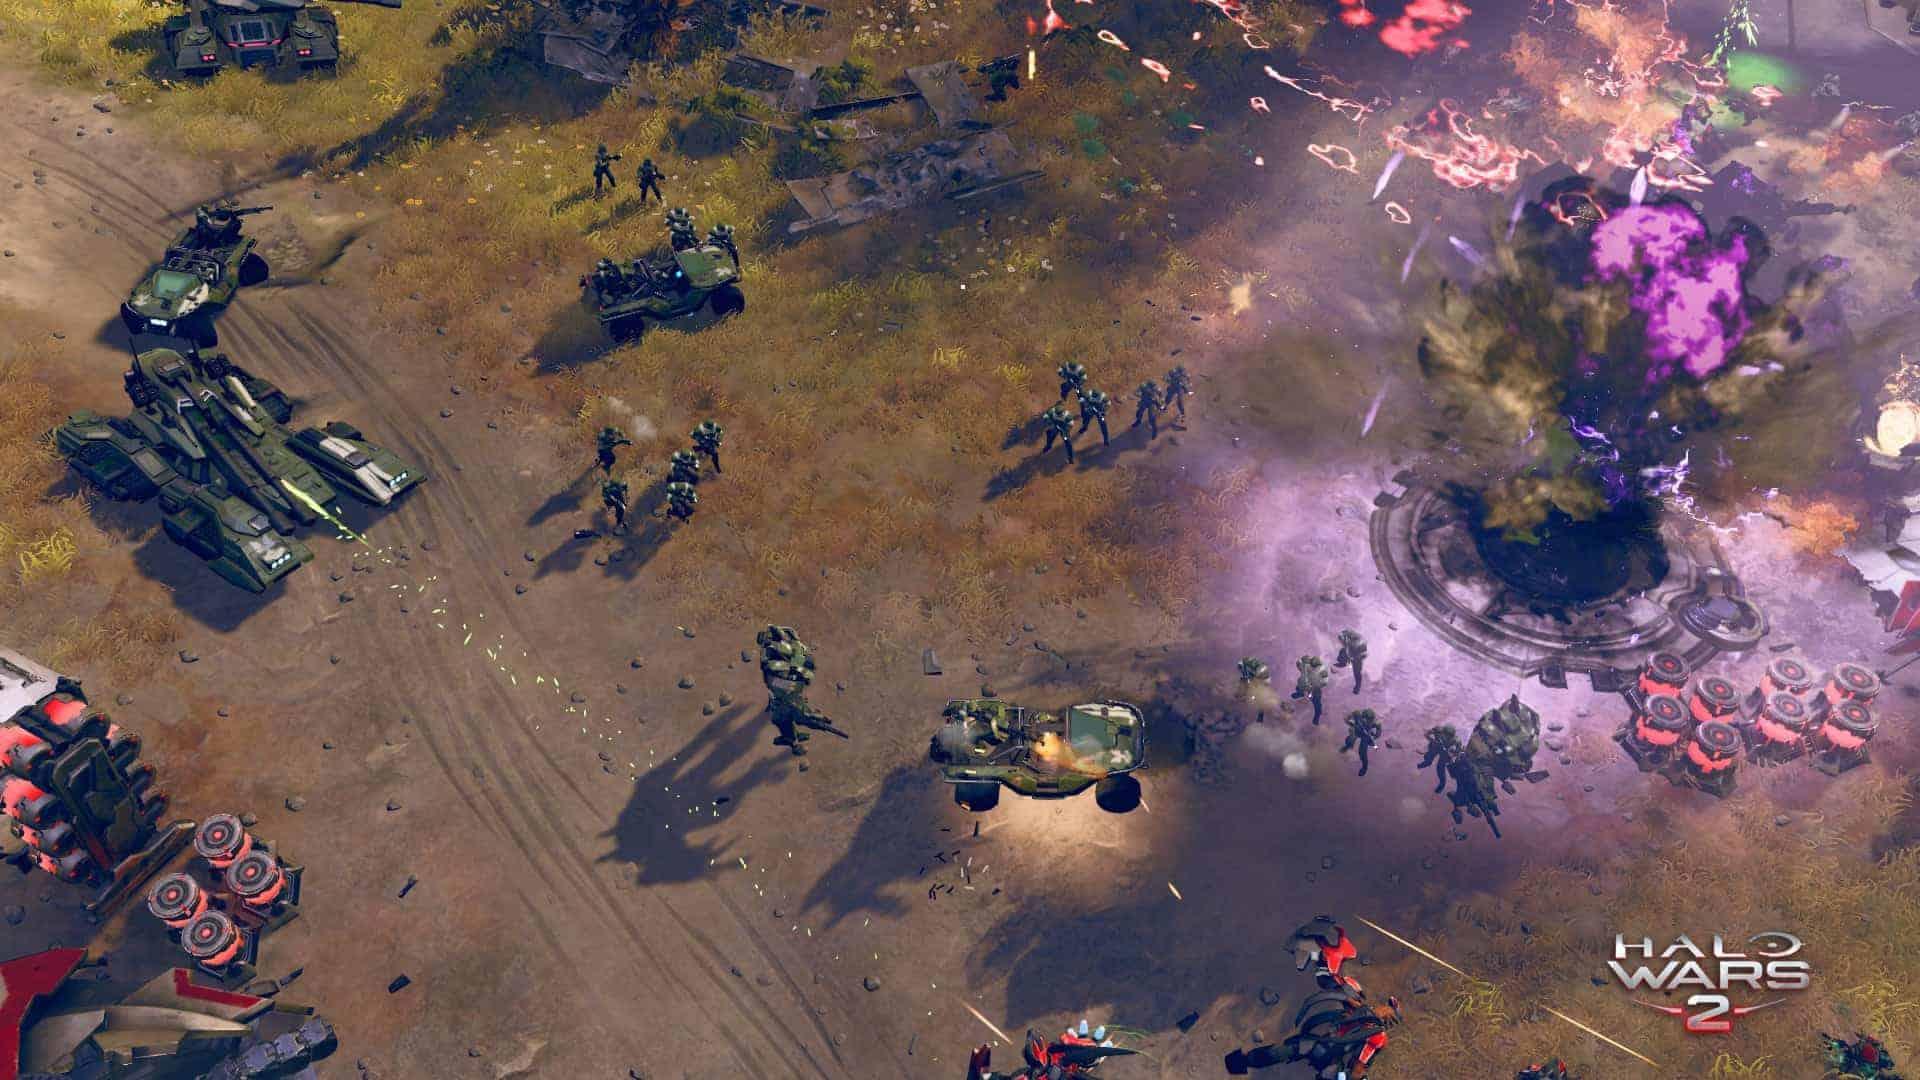 Halo wars: definitive edition free download (hotfix 2) « igggames.